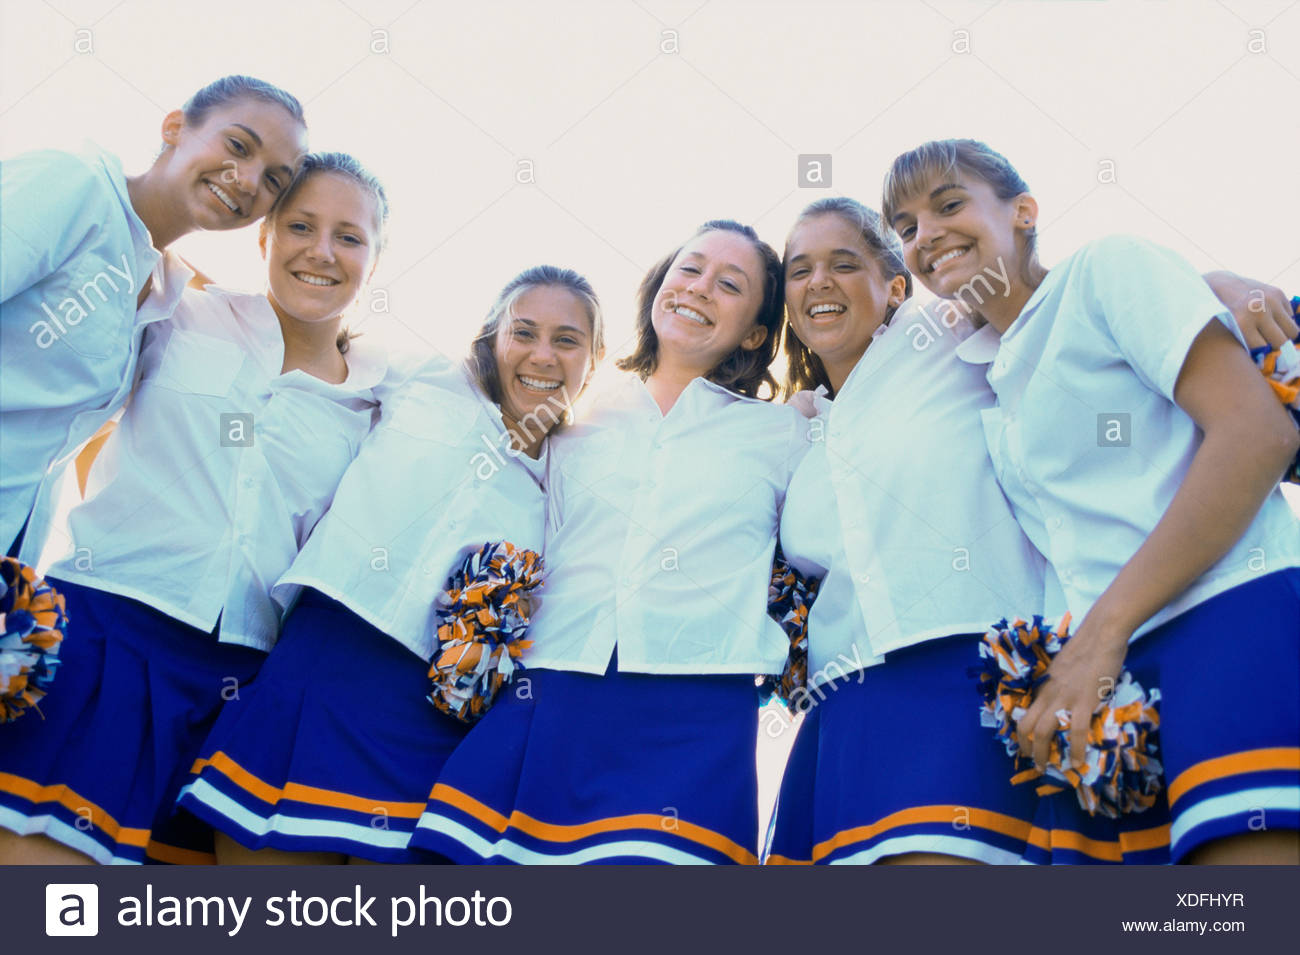 Teen cheer girl group pics apologise, but